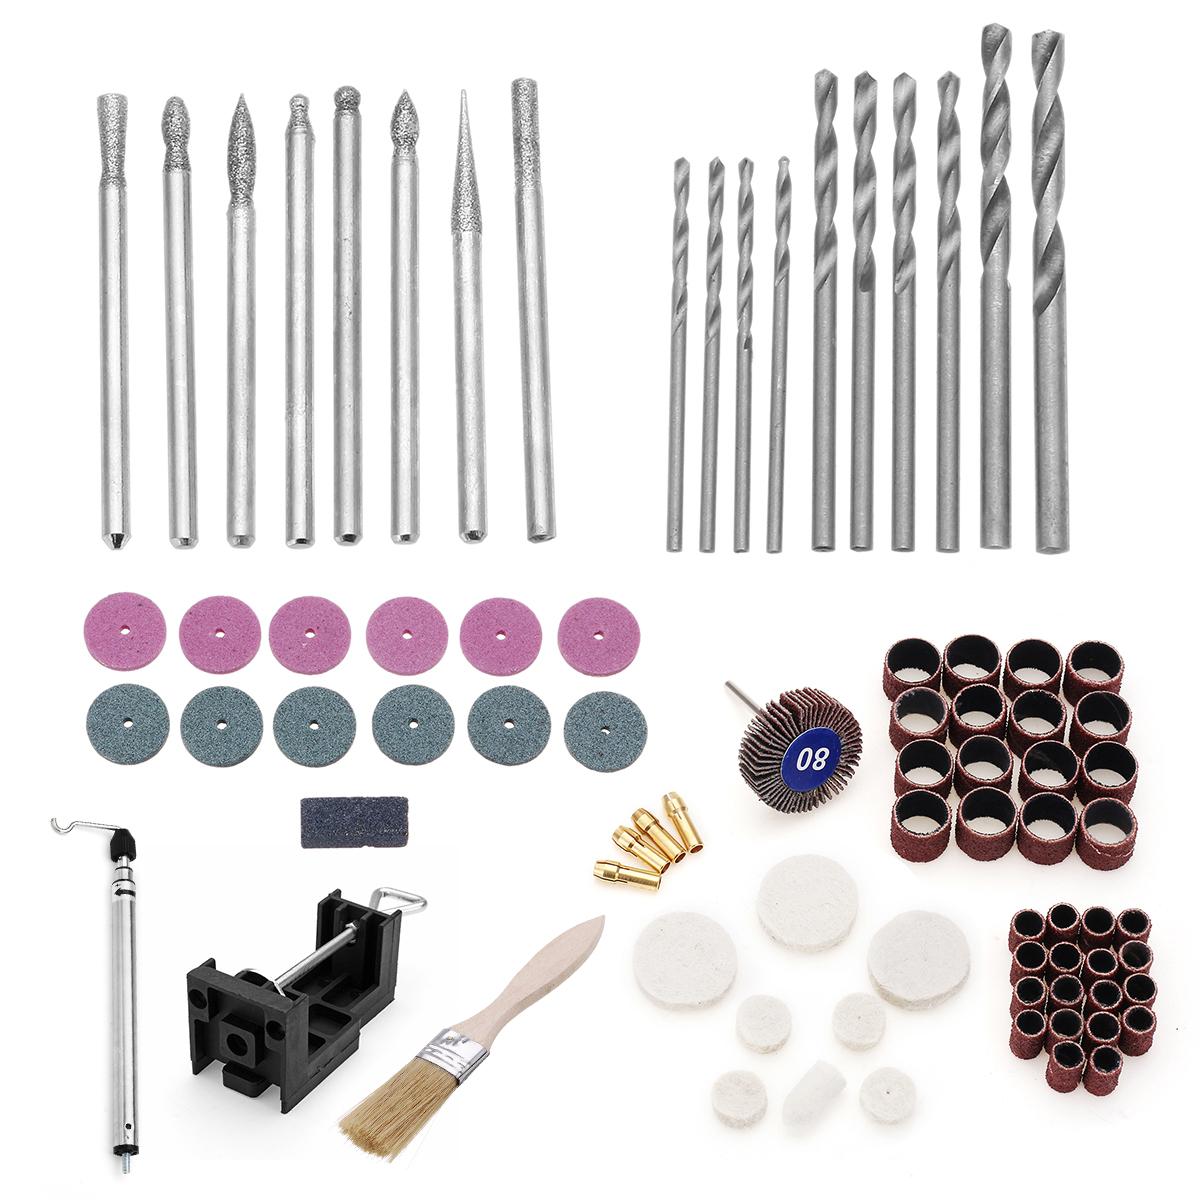 173Pcs Grinding Carving Tool Kit Mini Drill Set Electric Grinder Polishing Machine Craft Grinding